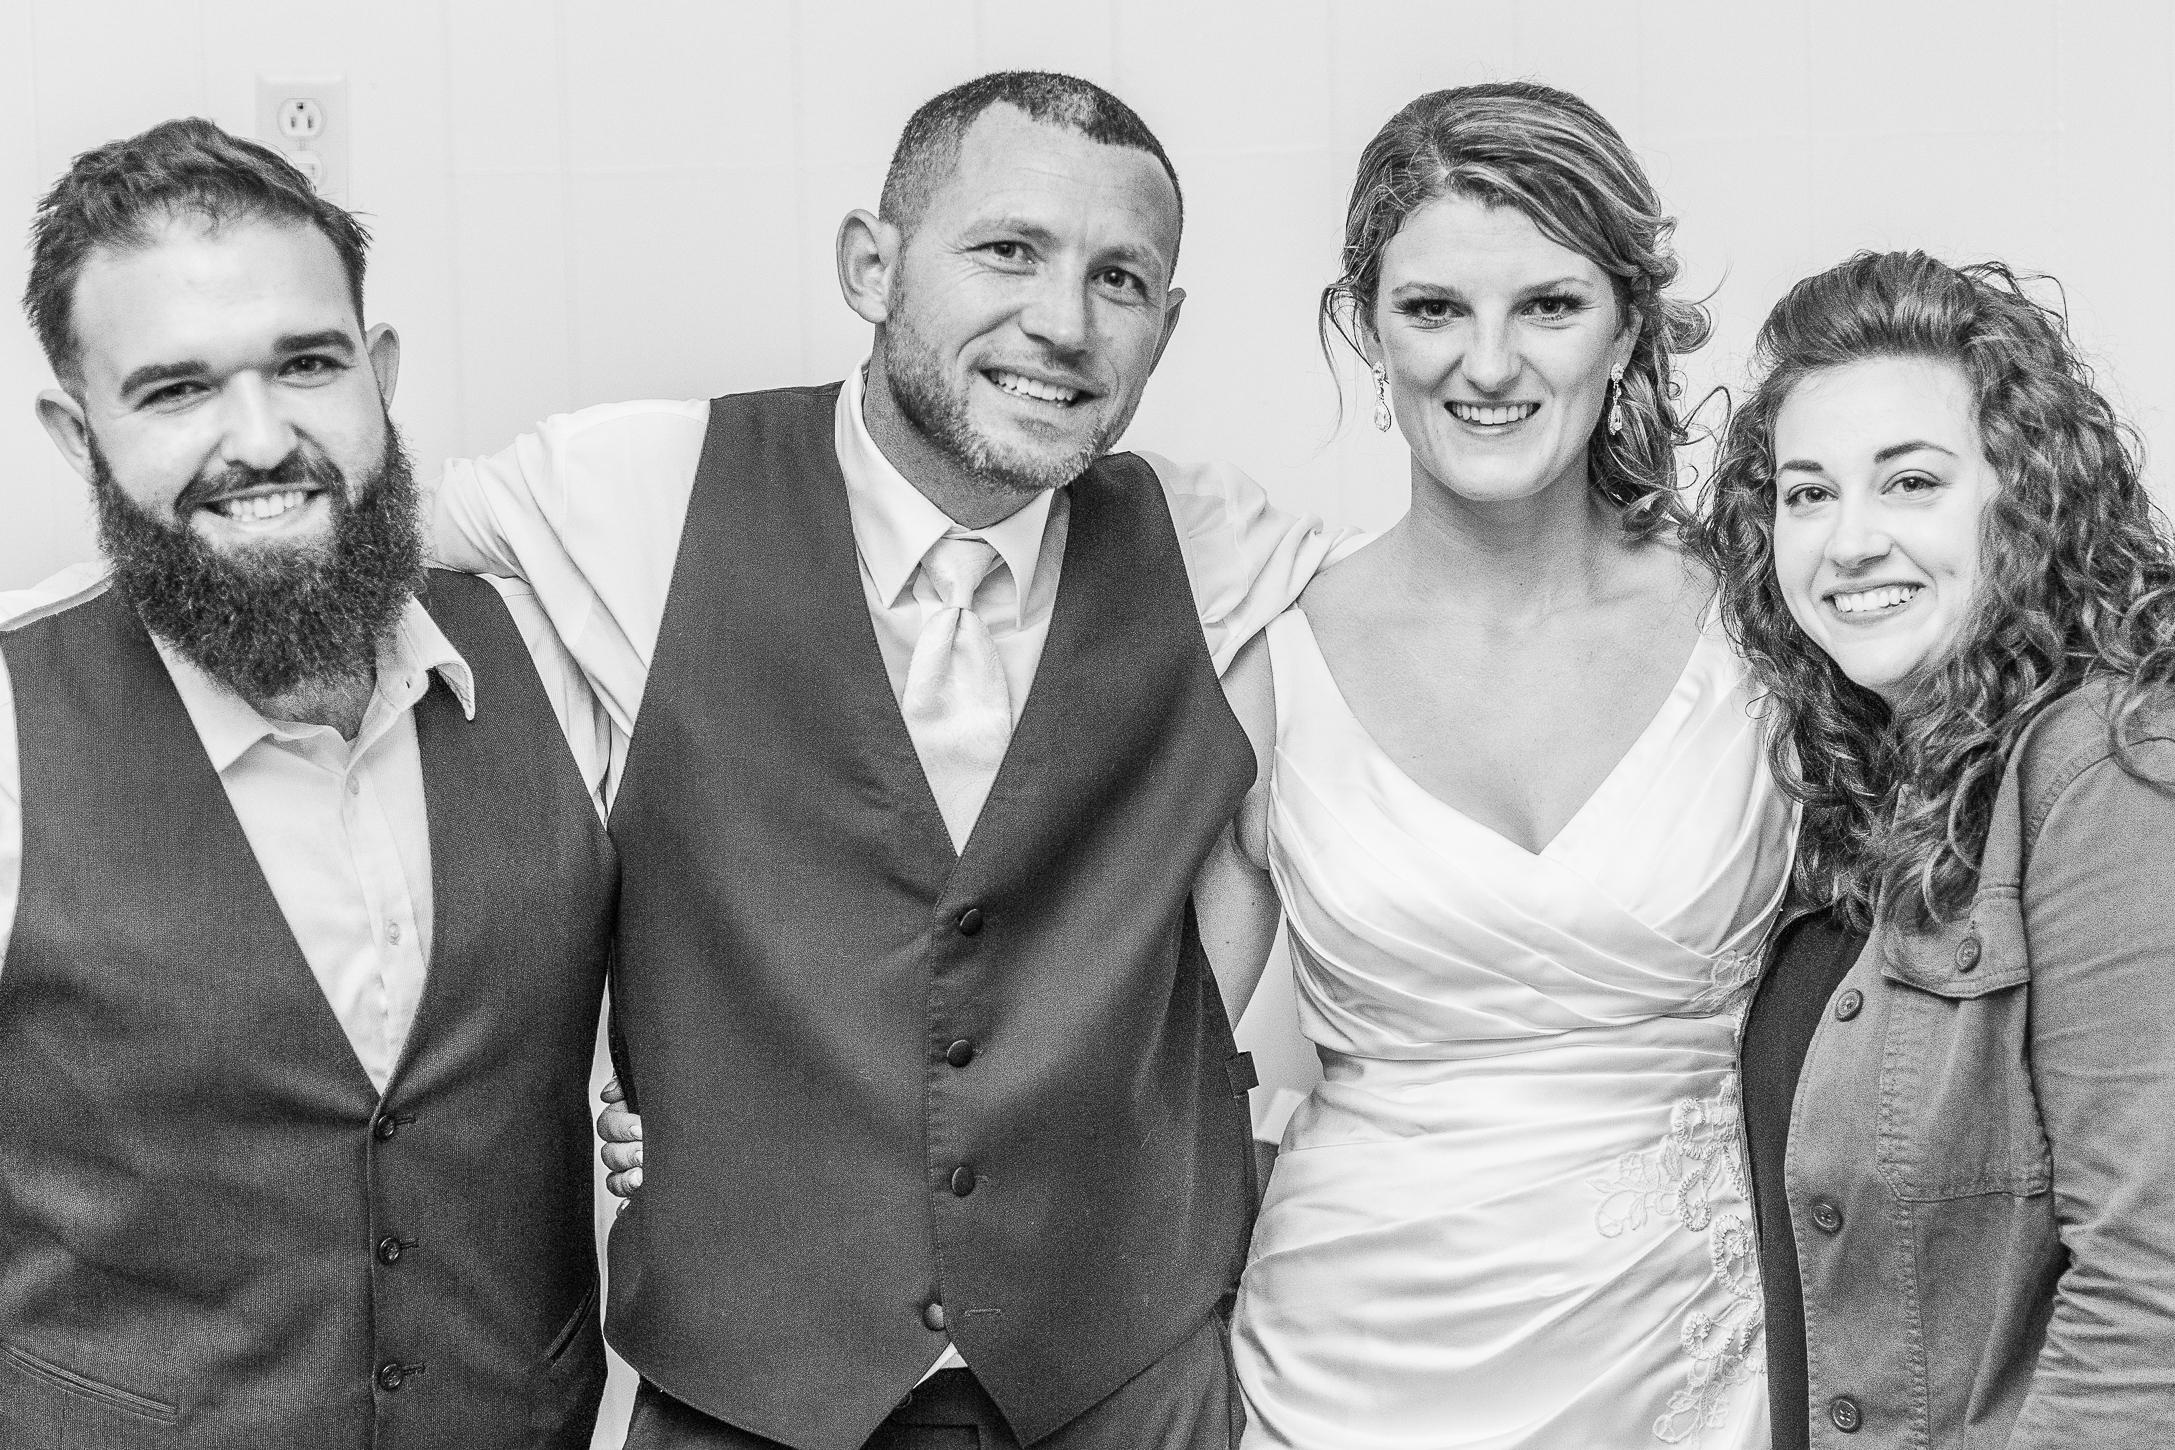 Pennsylvania October Fall Lehigh Valley wedding and lifestyle photographer Lytle Photo Co (1 of 1)-2.jpg